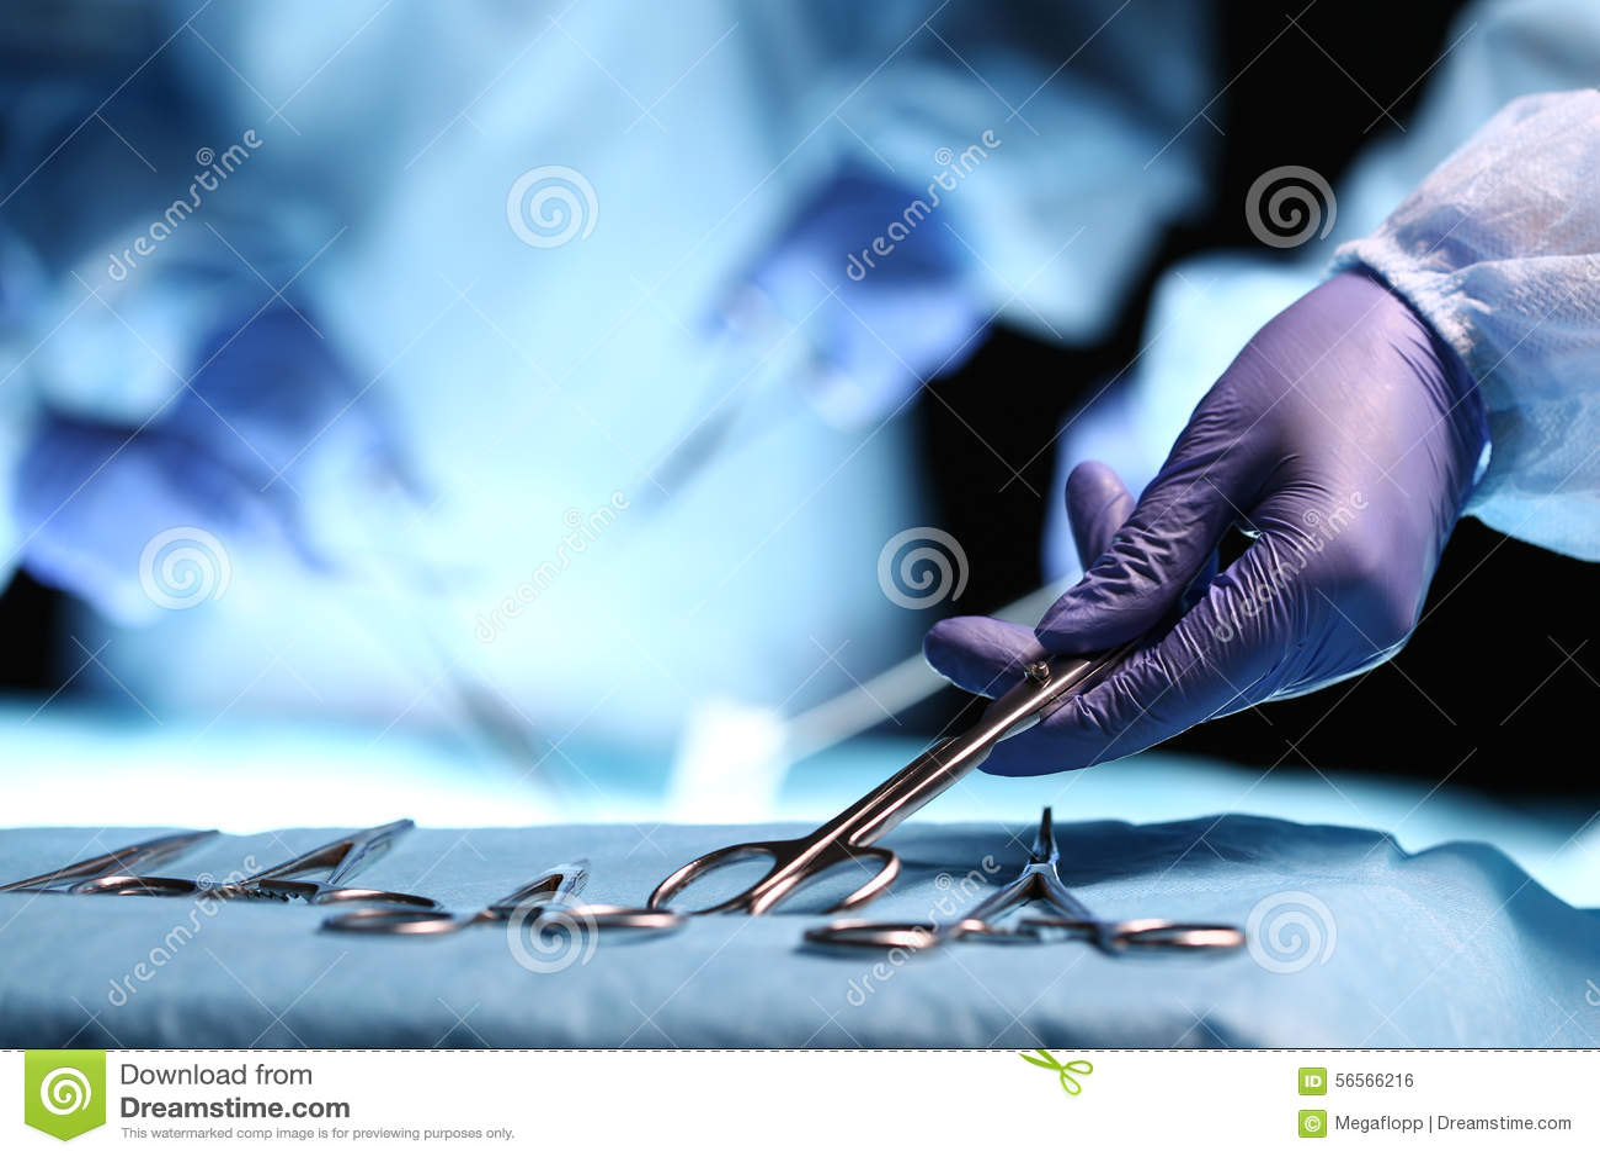 Download Χέρι νοσοκόμων που παίρνει το χειρουργικό όργανο Στοκ Εικόνες - εικόνα από θεραπεύστε, γάντι: 56566216